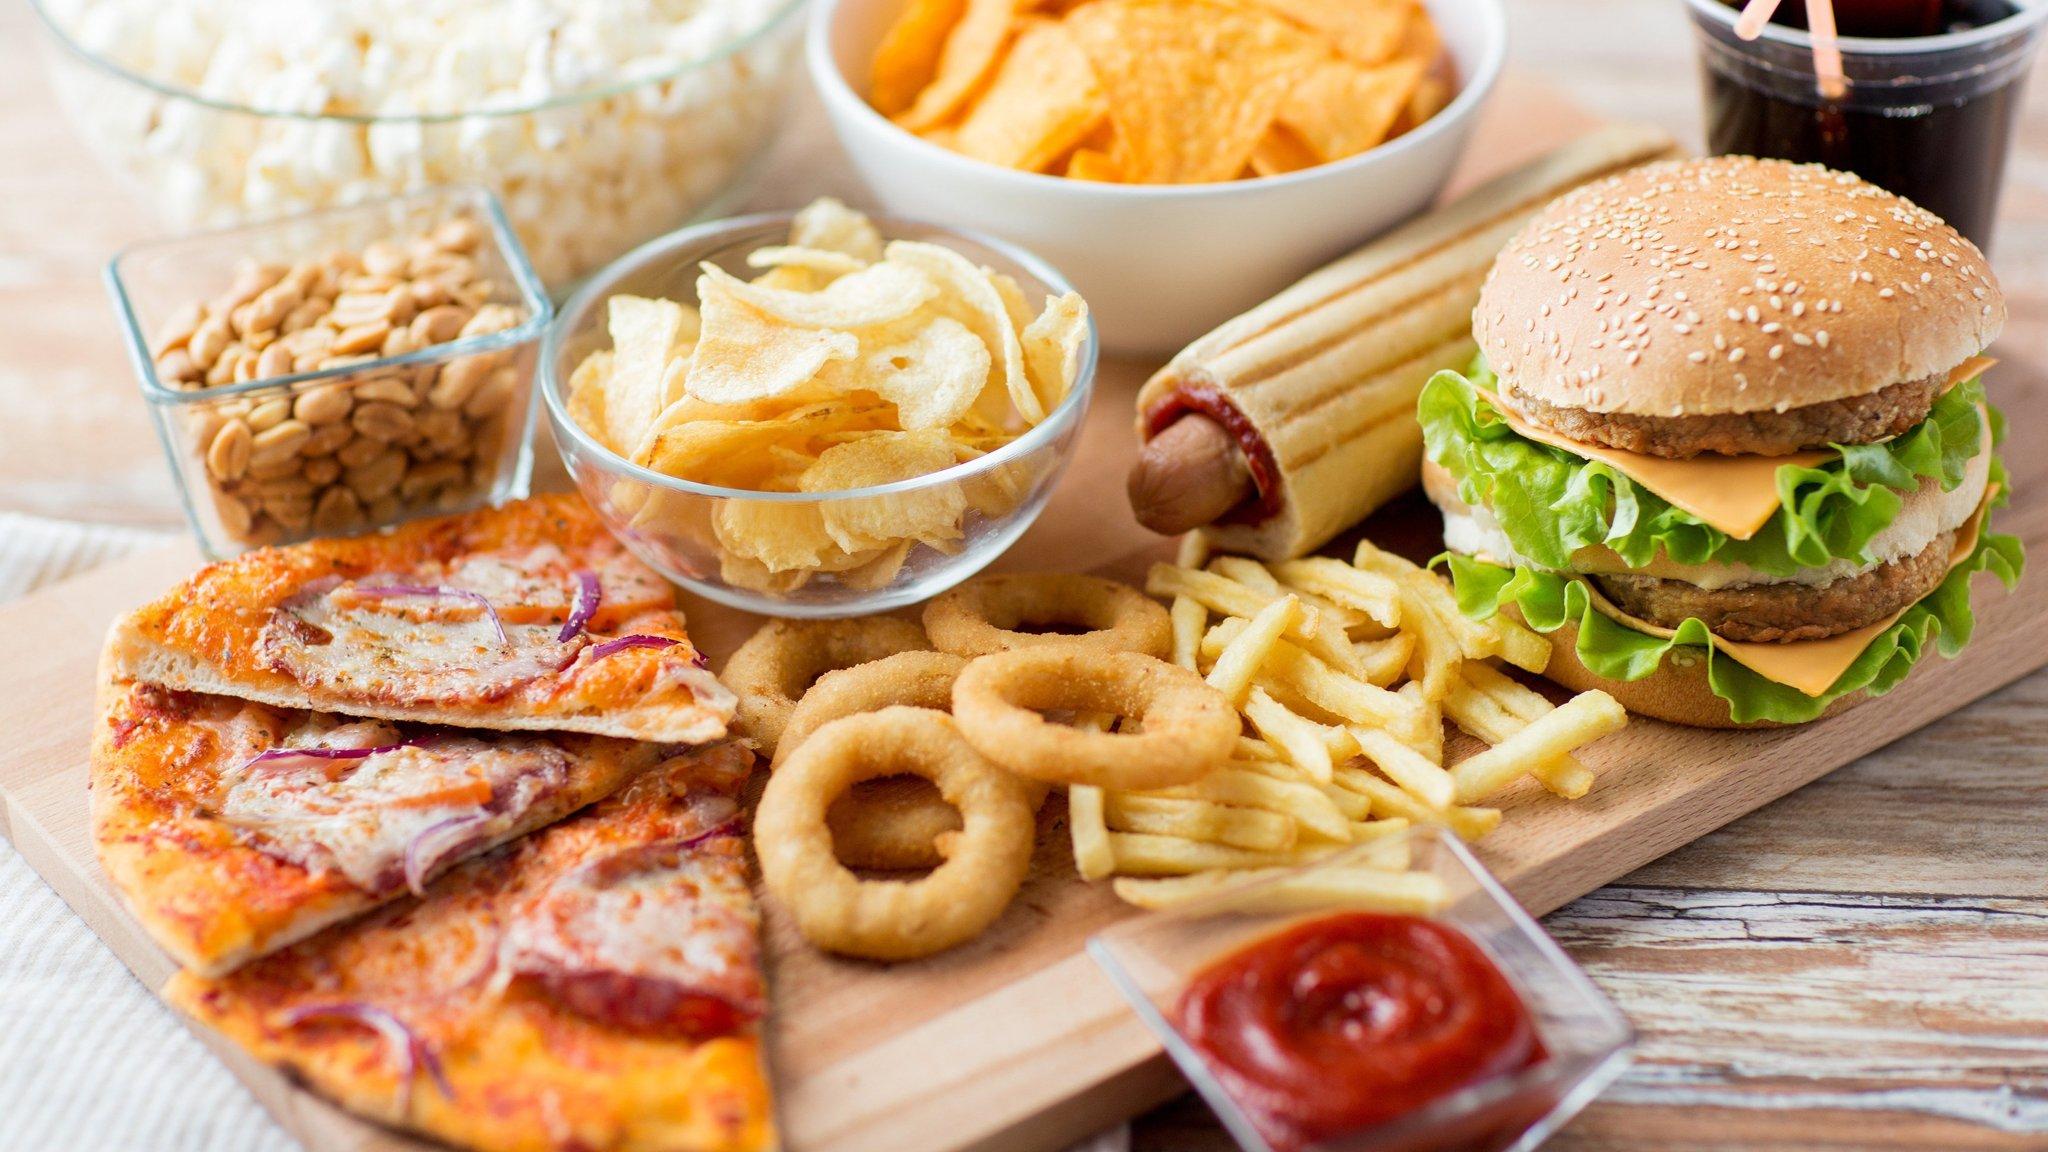 Online Junk Food Advertising Ban Welcomed